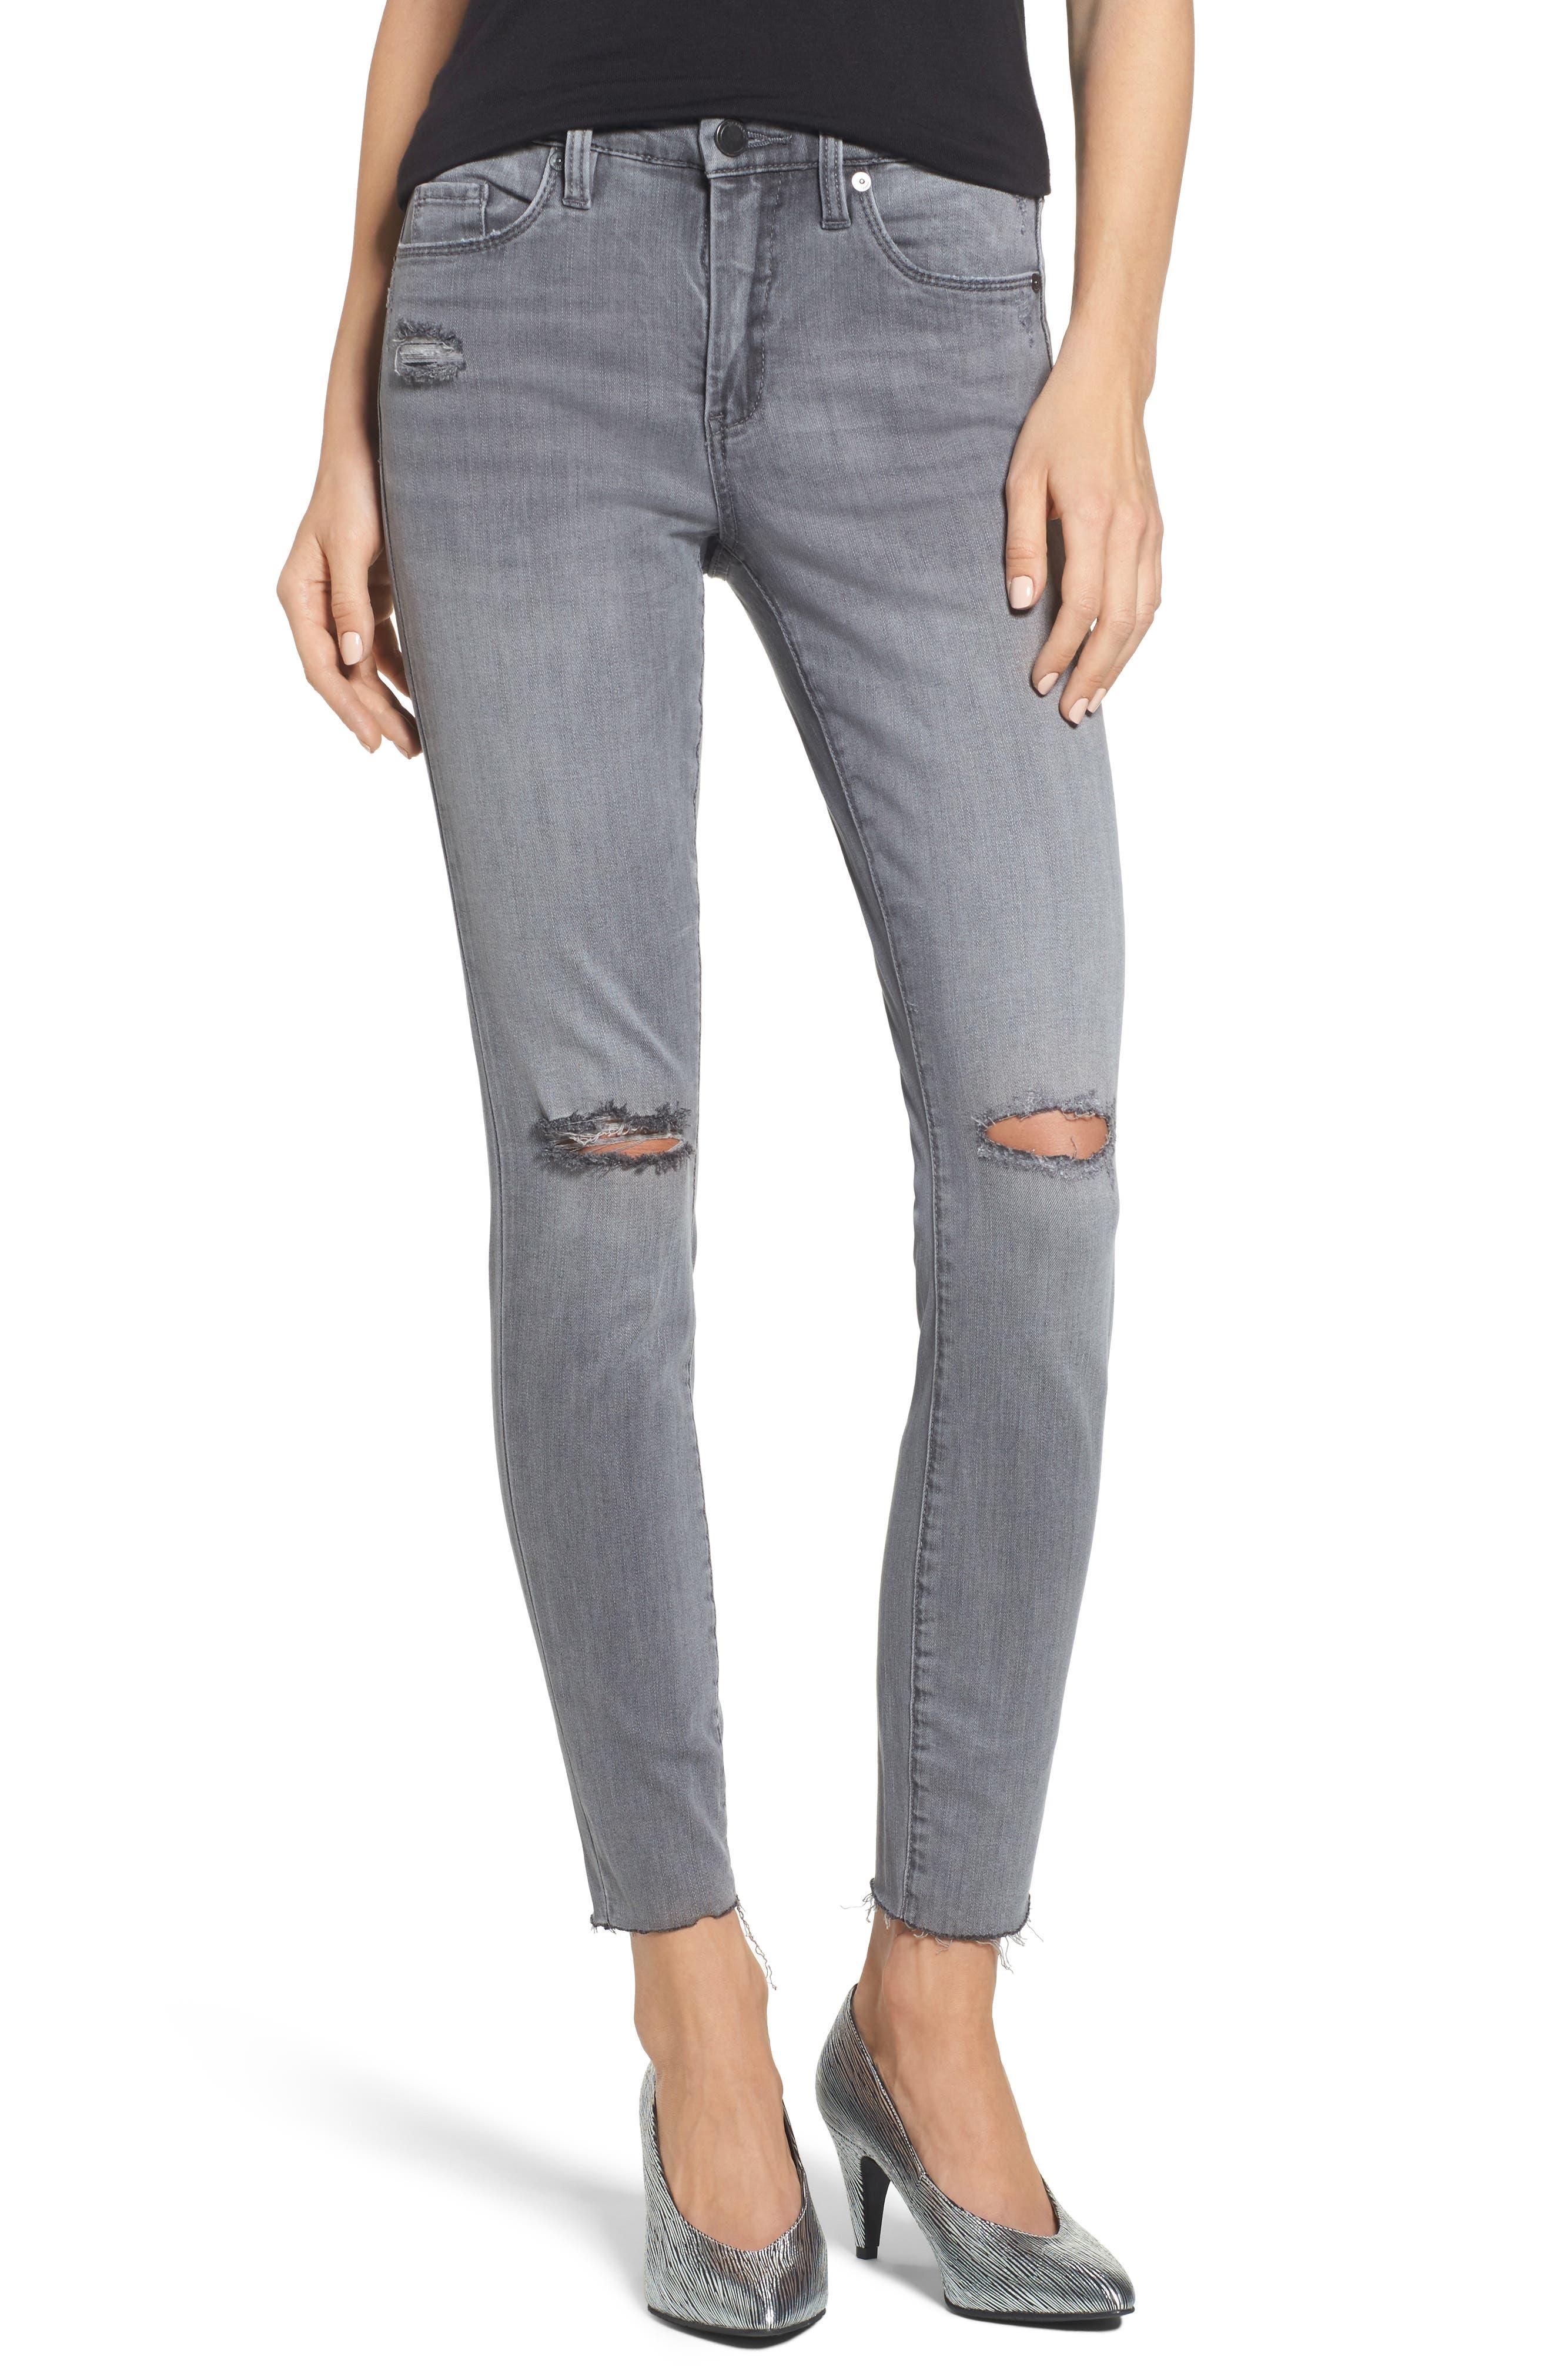 BLANKNYC Tequila Royale Skinny Jeans